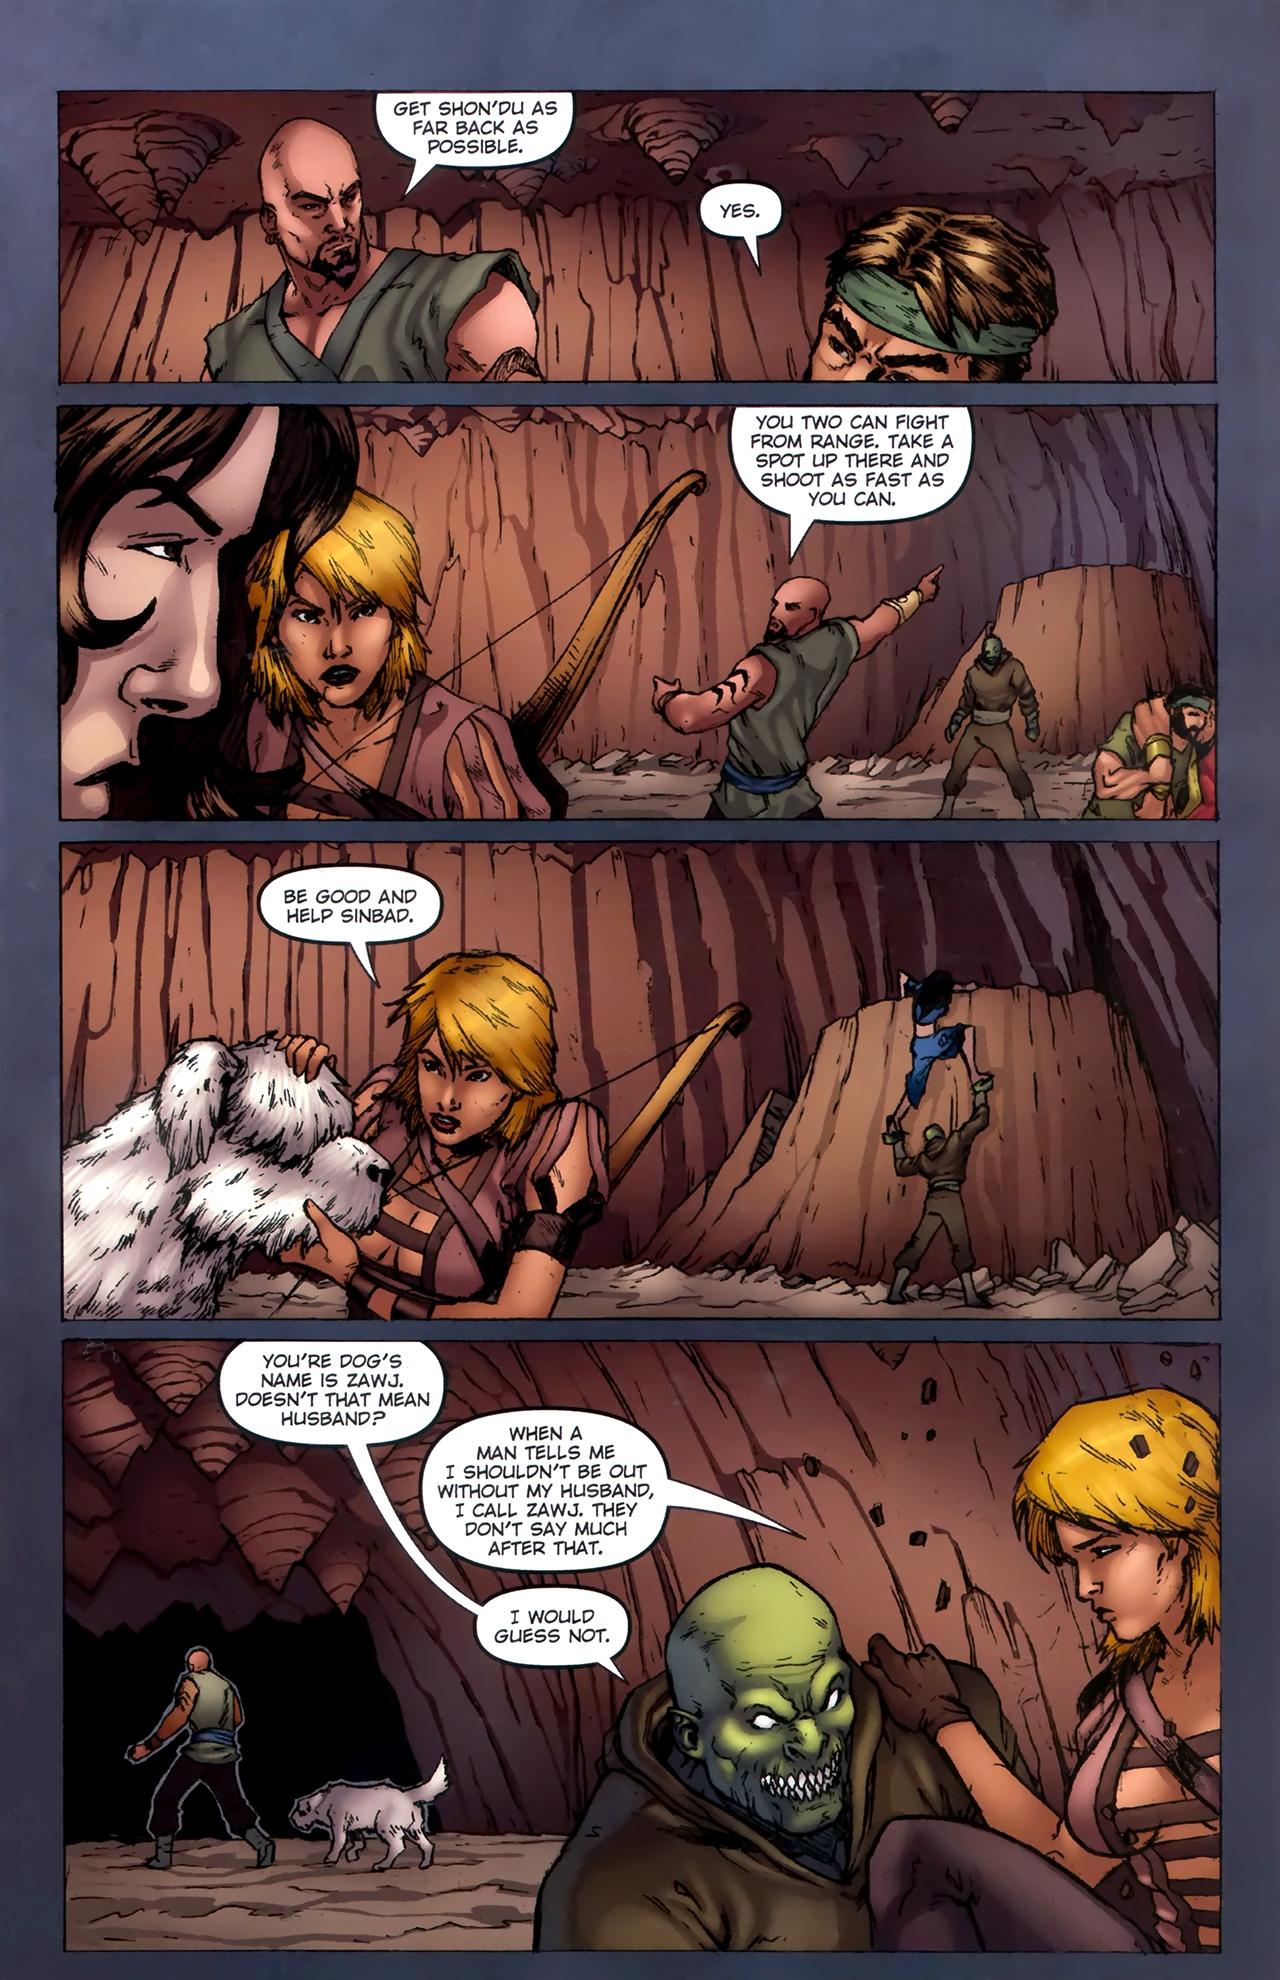 Read online 1001 Arabian Nights: The Adventures of Sinbad comic -  Issue #11 - 7